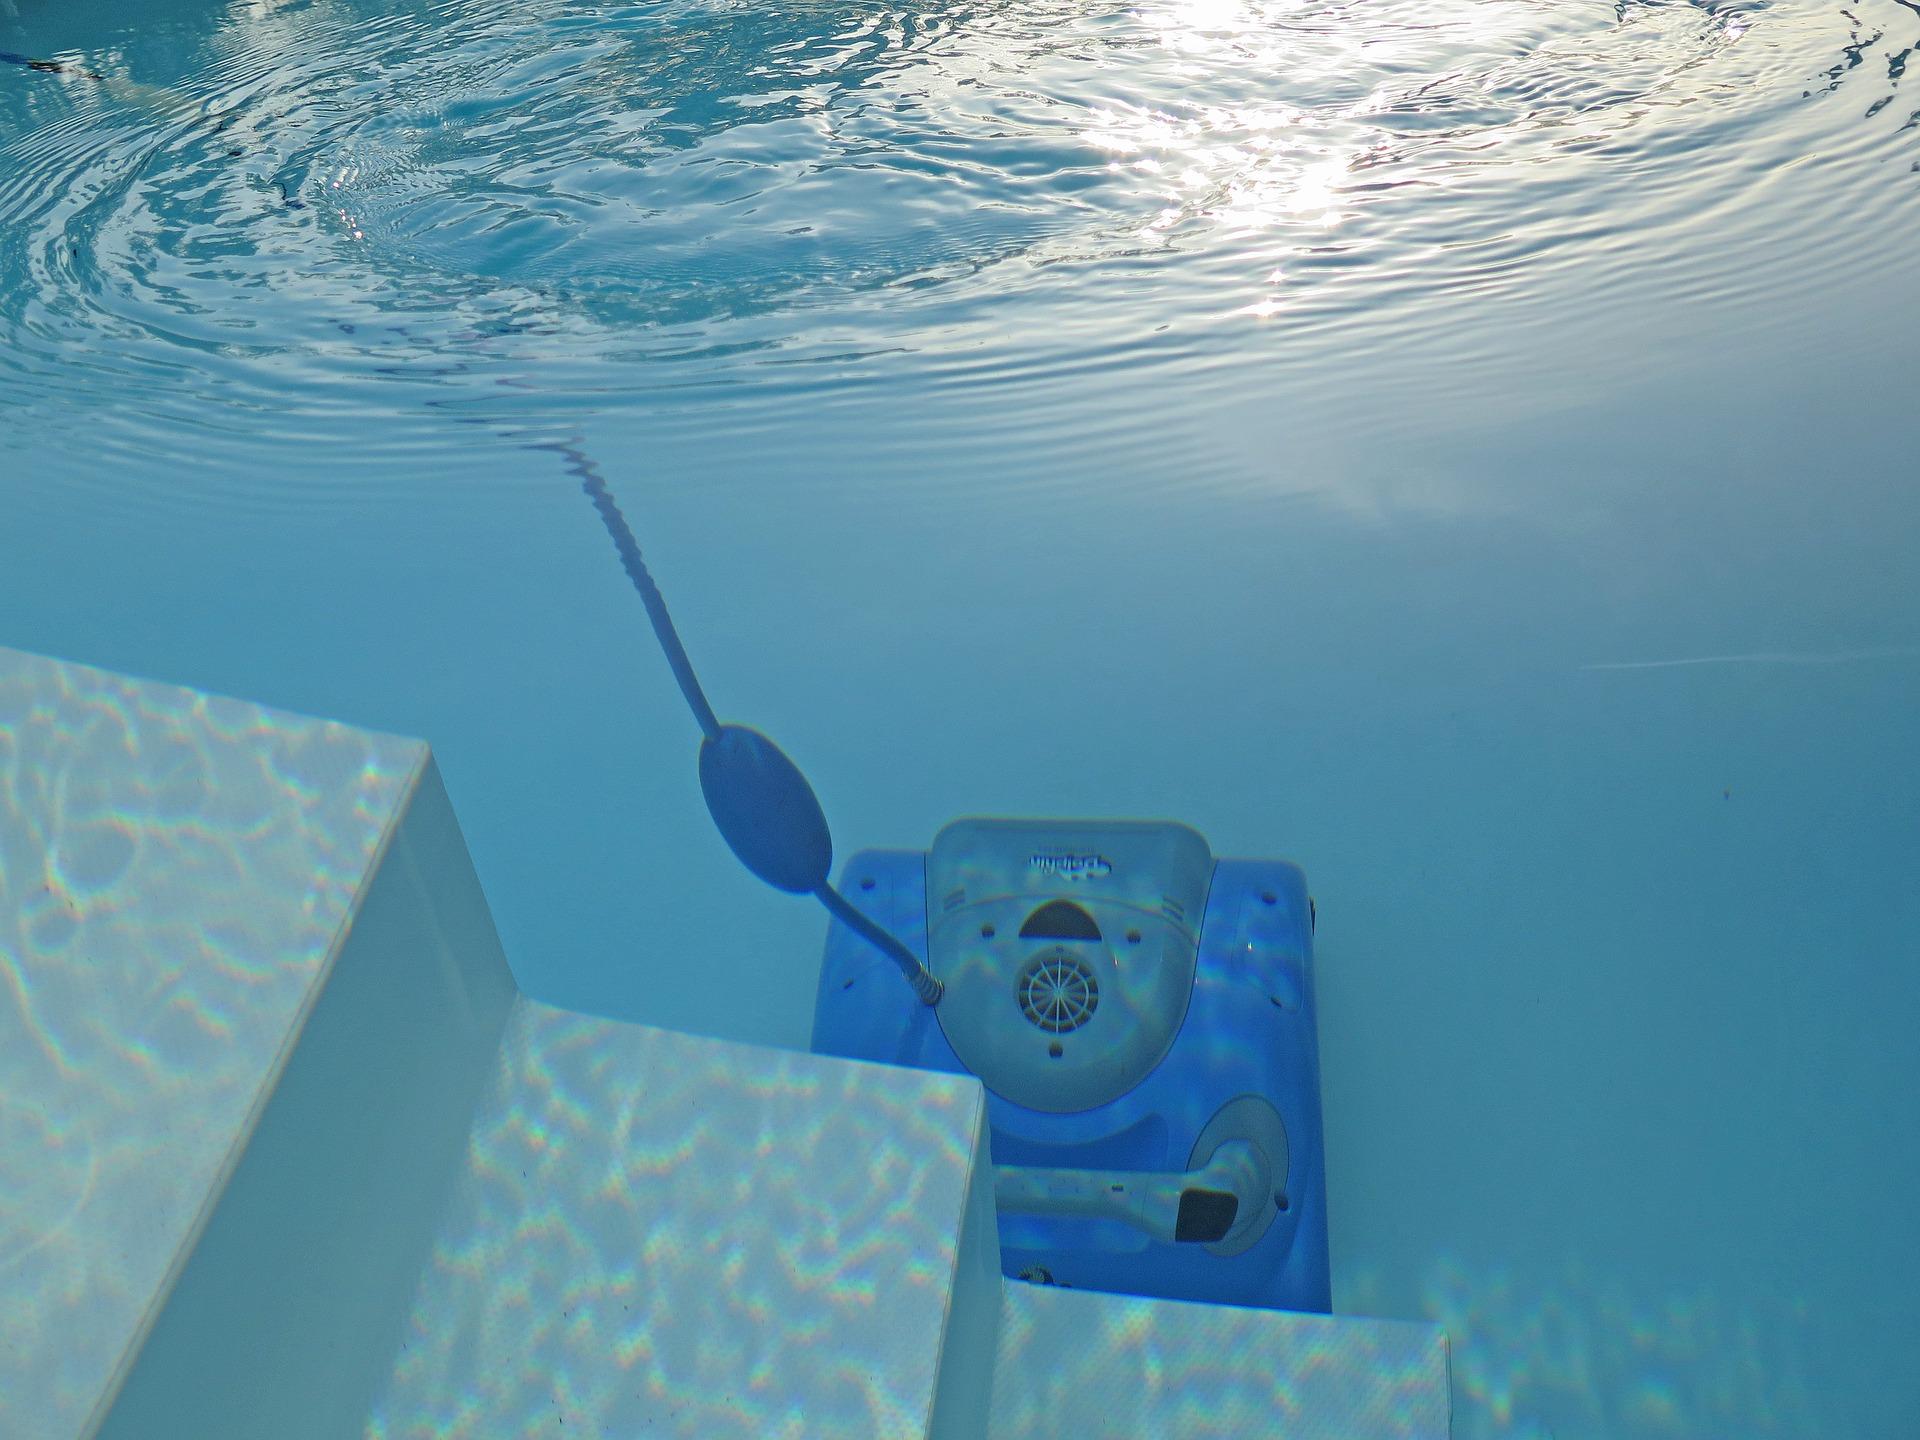 robot aspirateur nettoyant une piscine